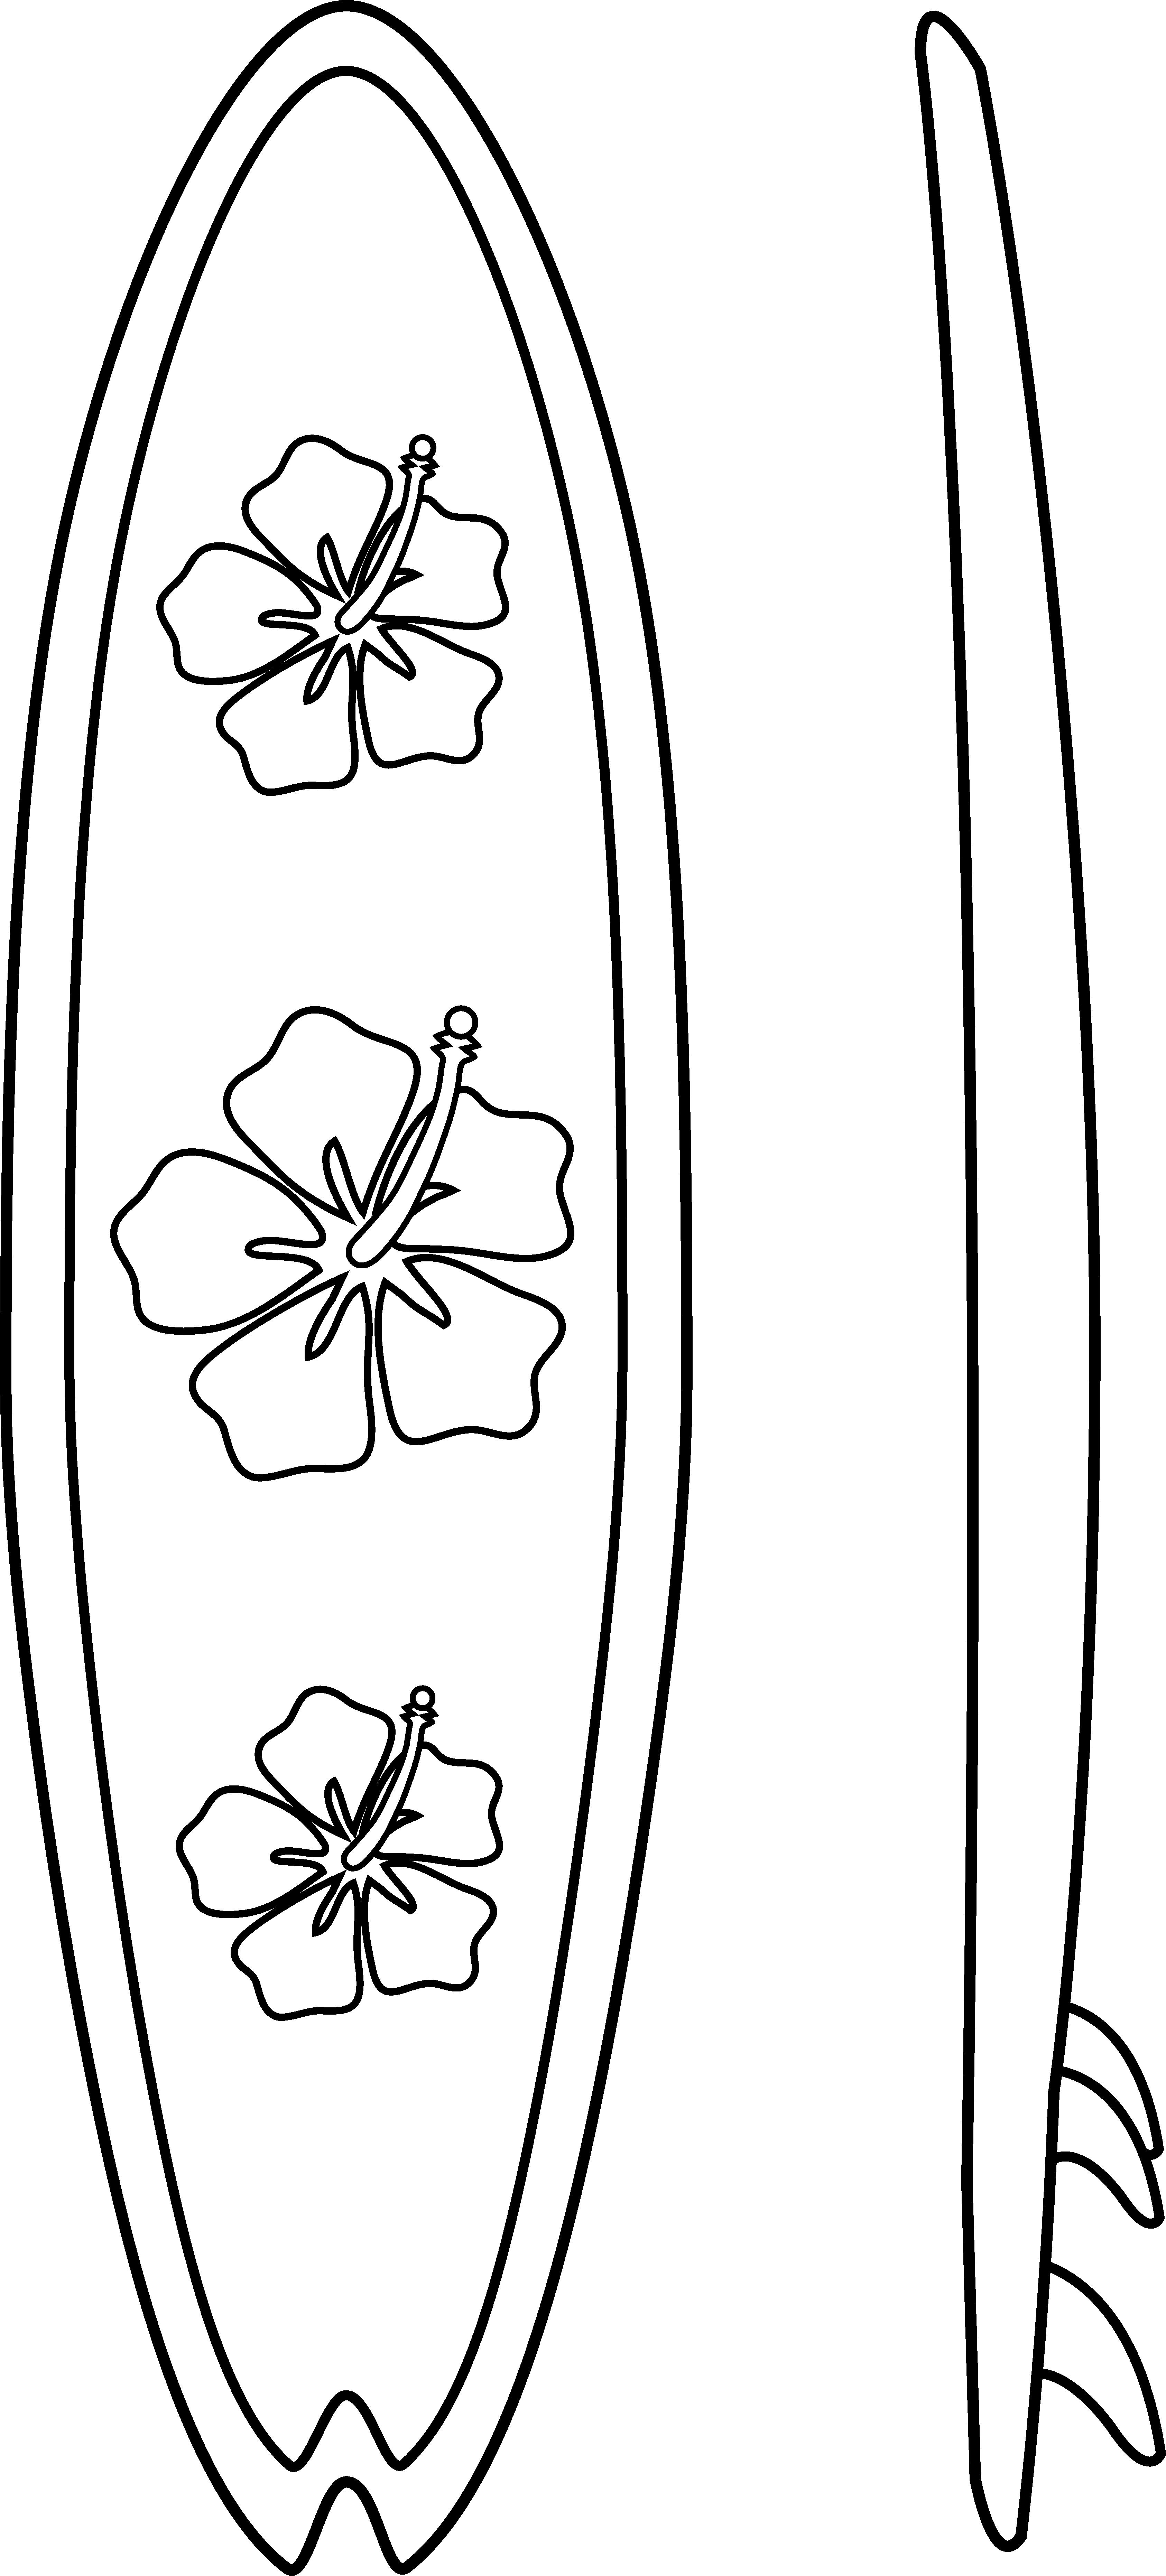 Surfboard outline clip art jpg black and white download Surfboards Outline | Vbs | Pinterest | Surfboards, Outlines and Clip art jpg black and white download